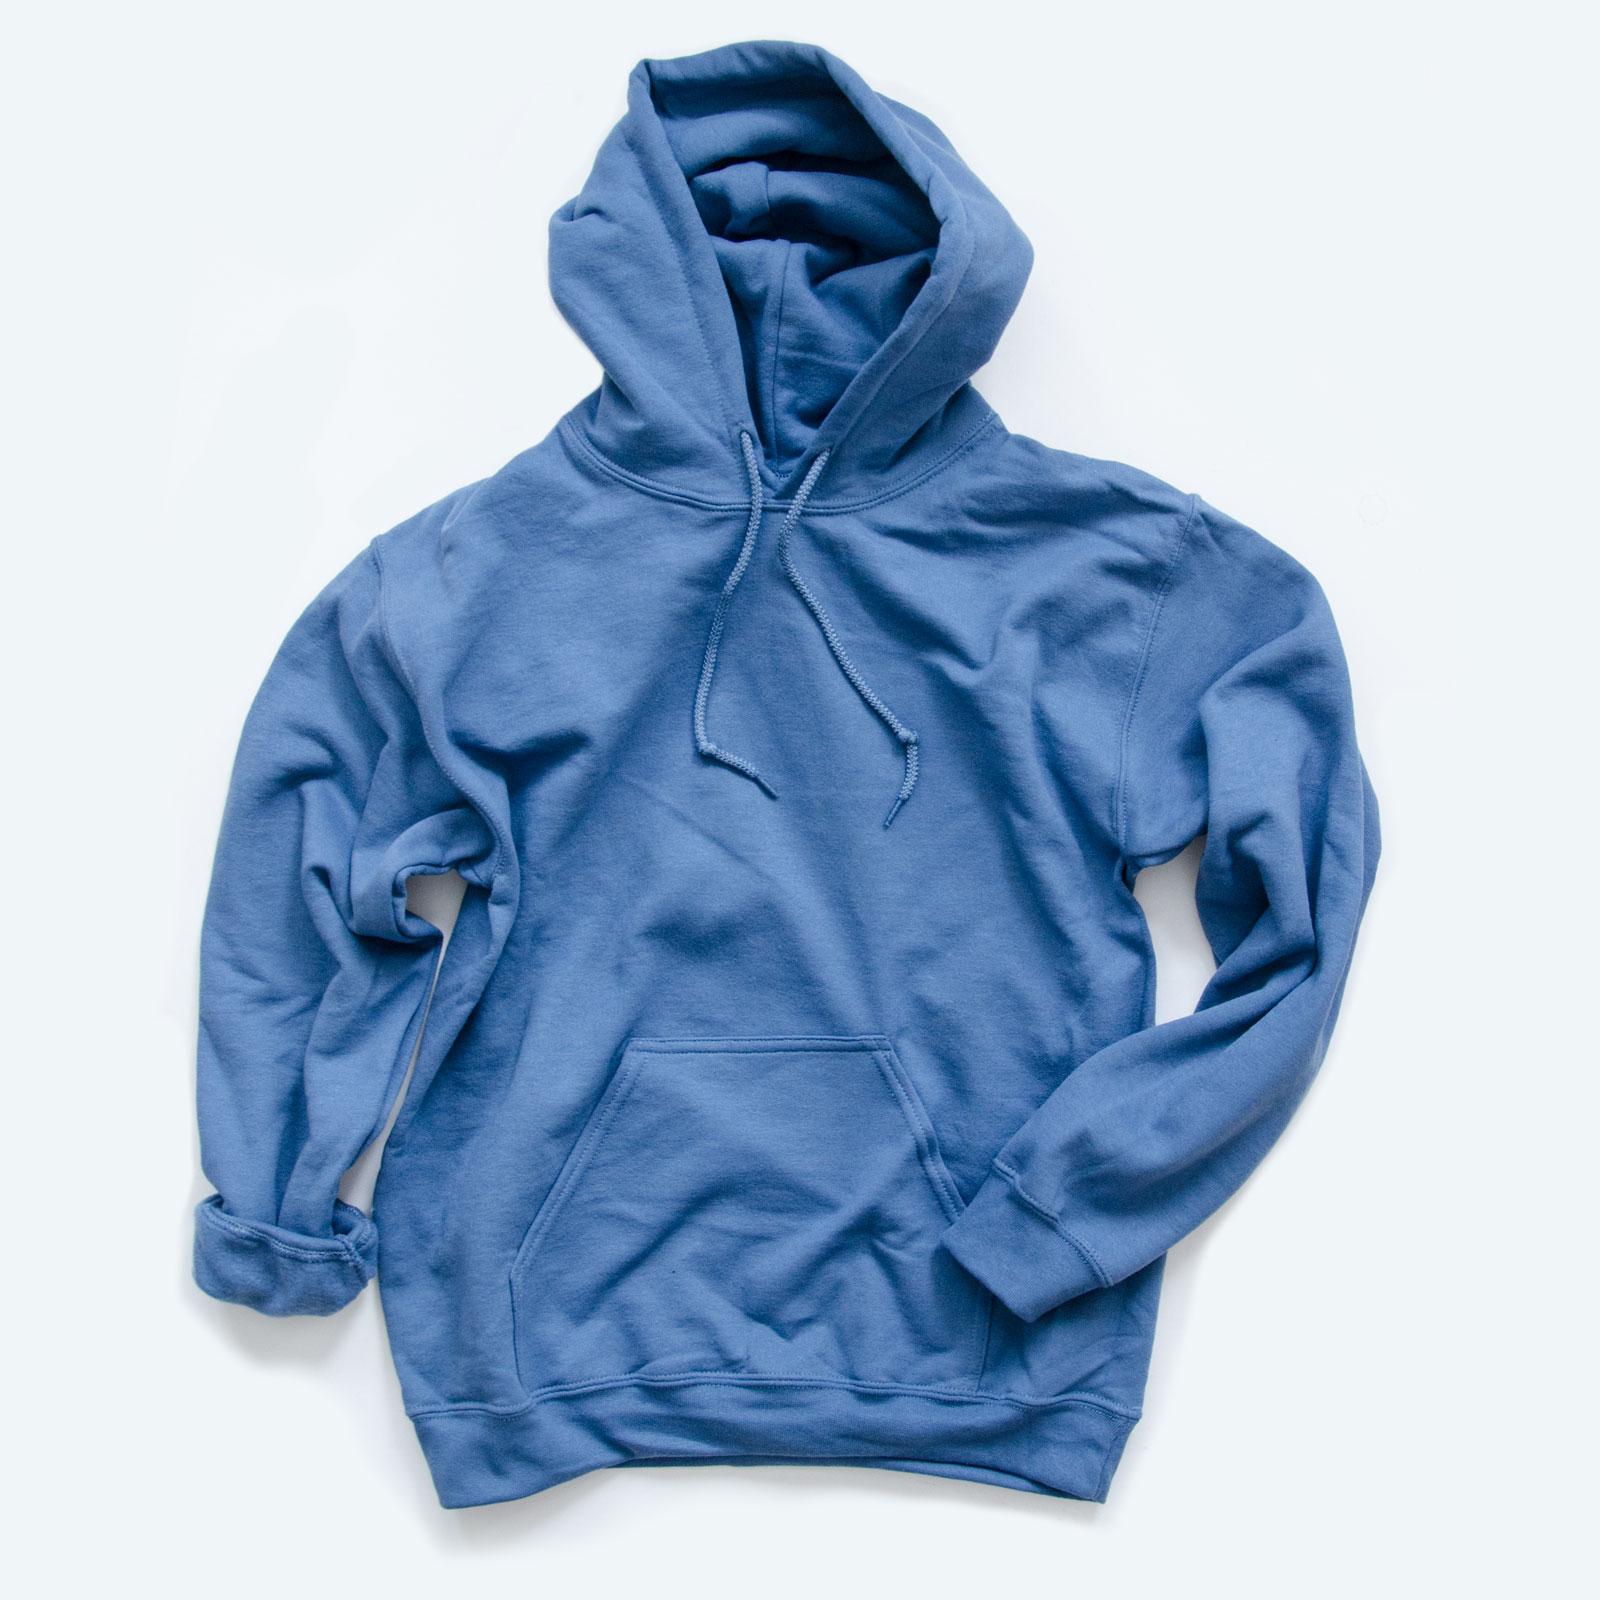 954d528eca79 Custom Pullover Hoodies